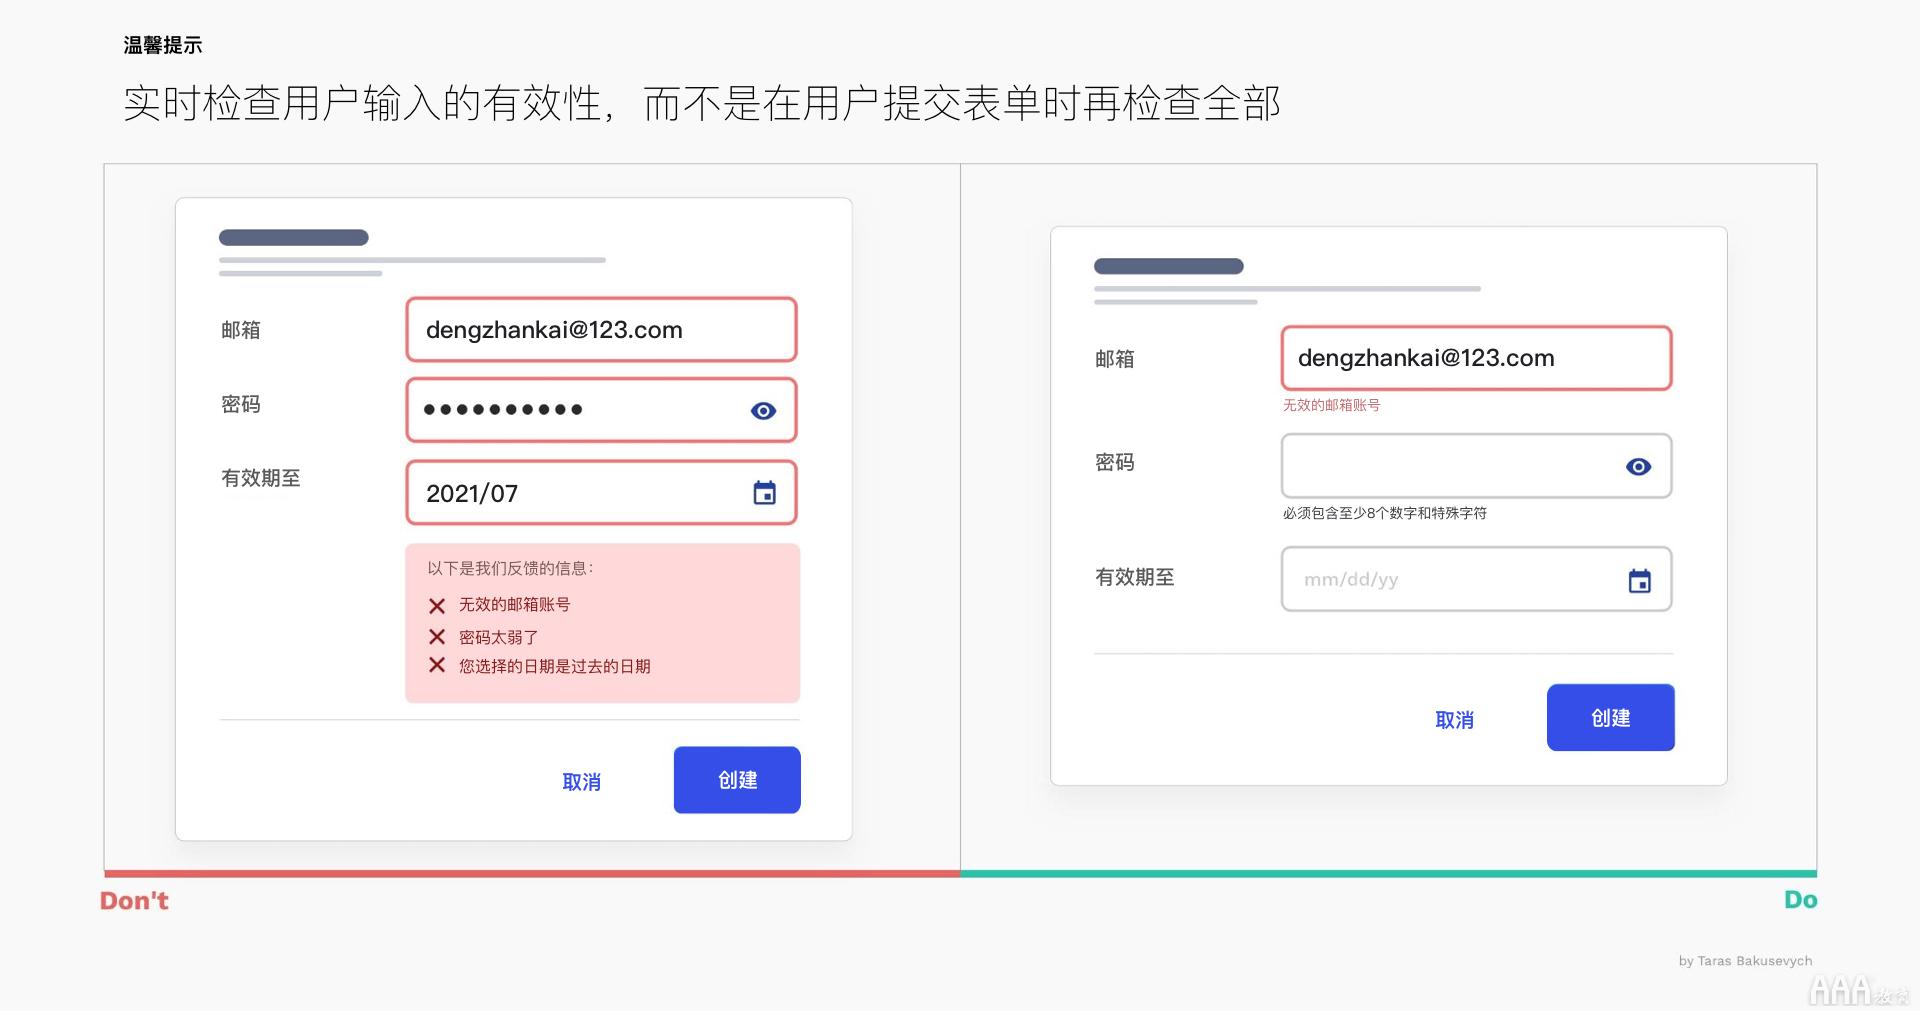 UI设计中文本框和表单设计怎么做